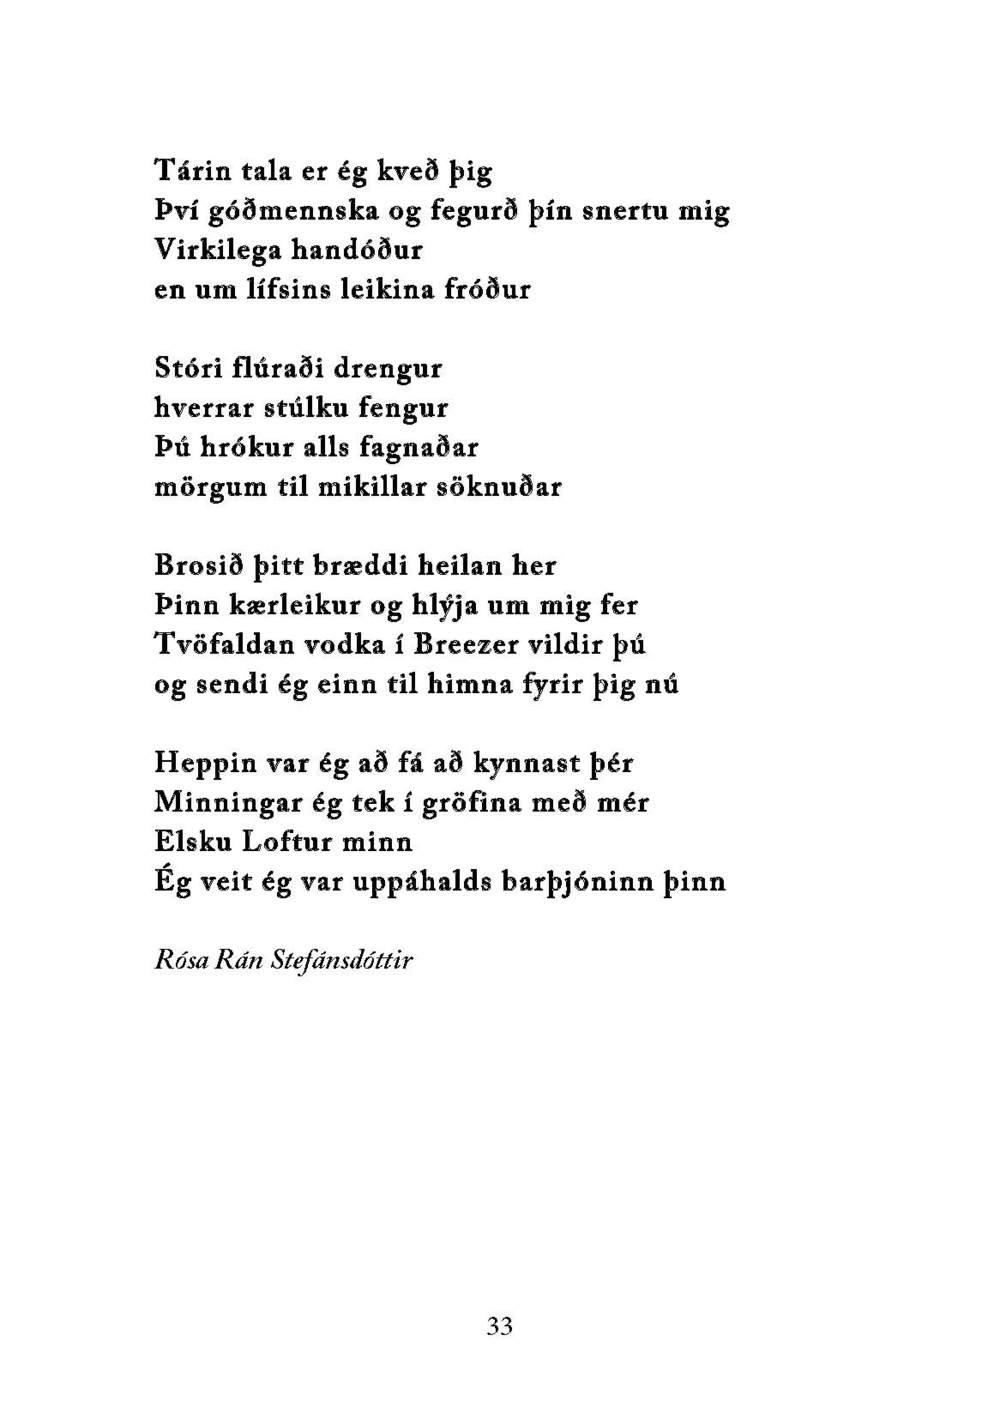 27073-ljodabokin--oll_Page_73.jpg